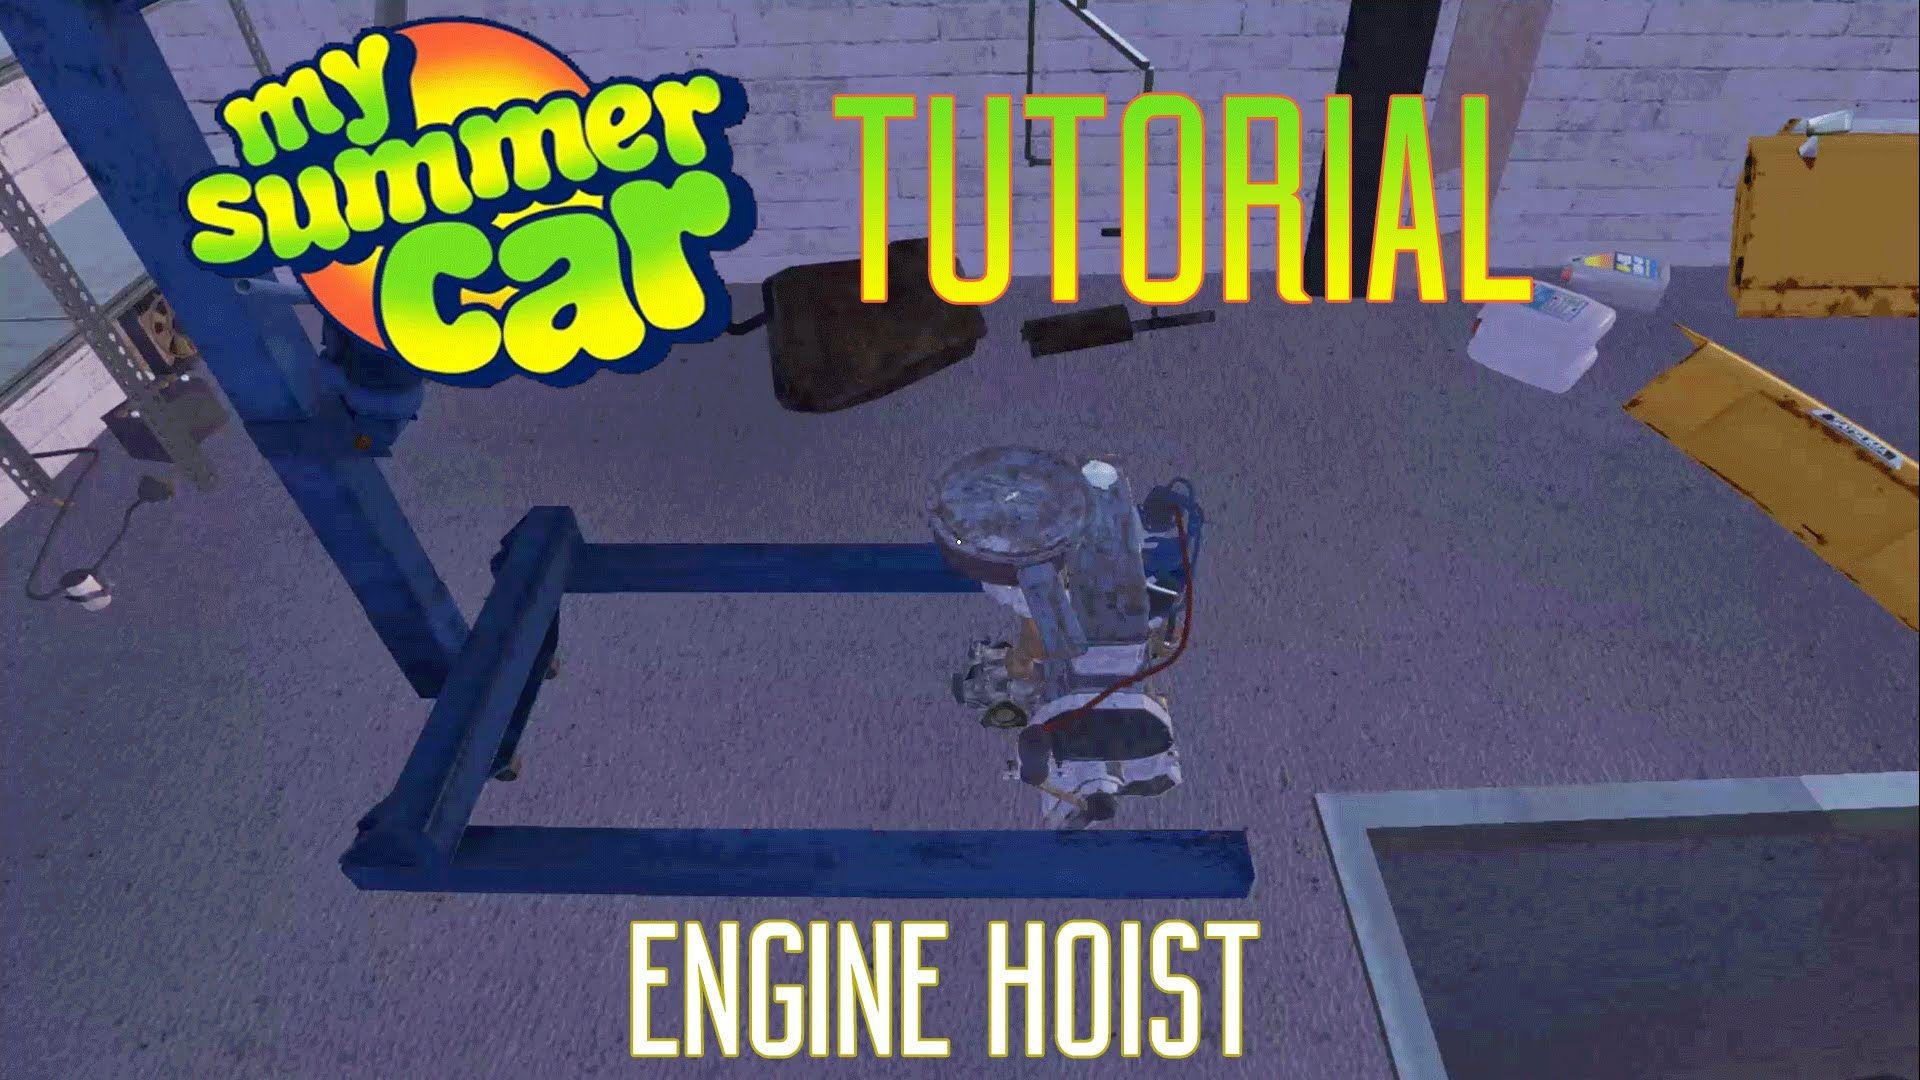 Pin By Scottdog Gaming On Scottdoggaming Car Engineering